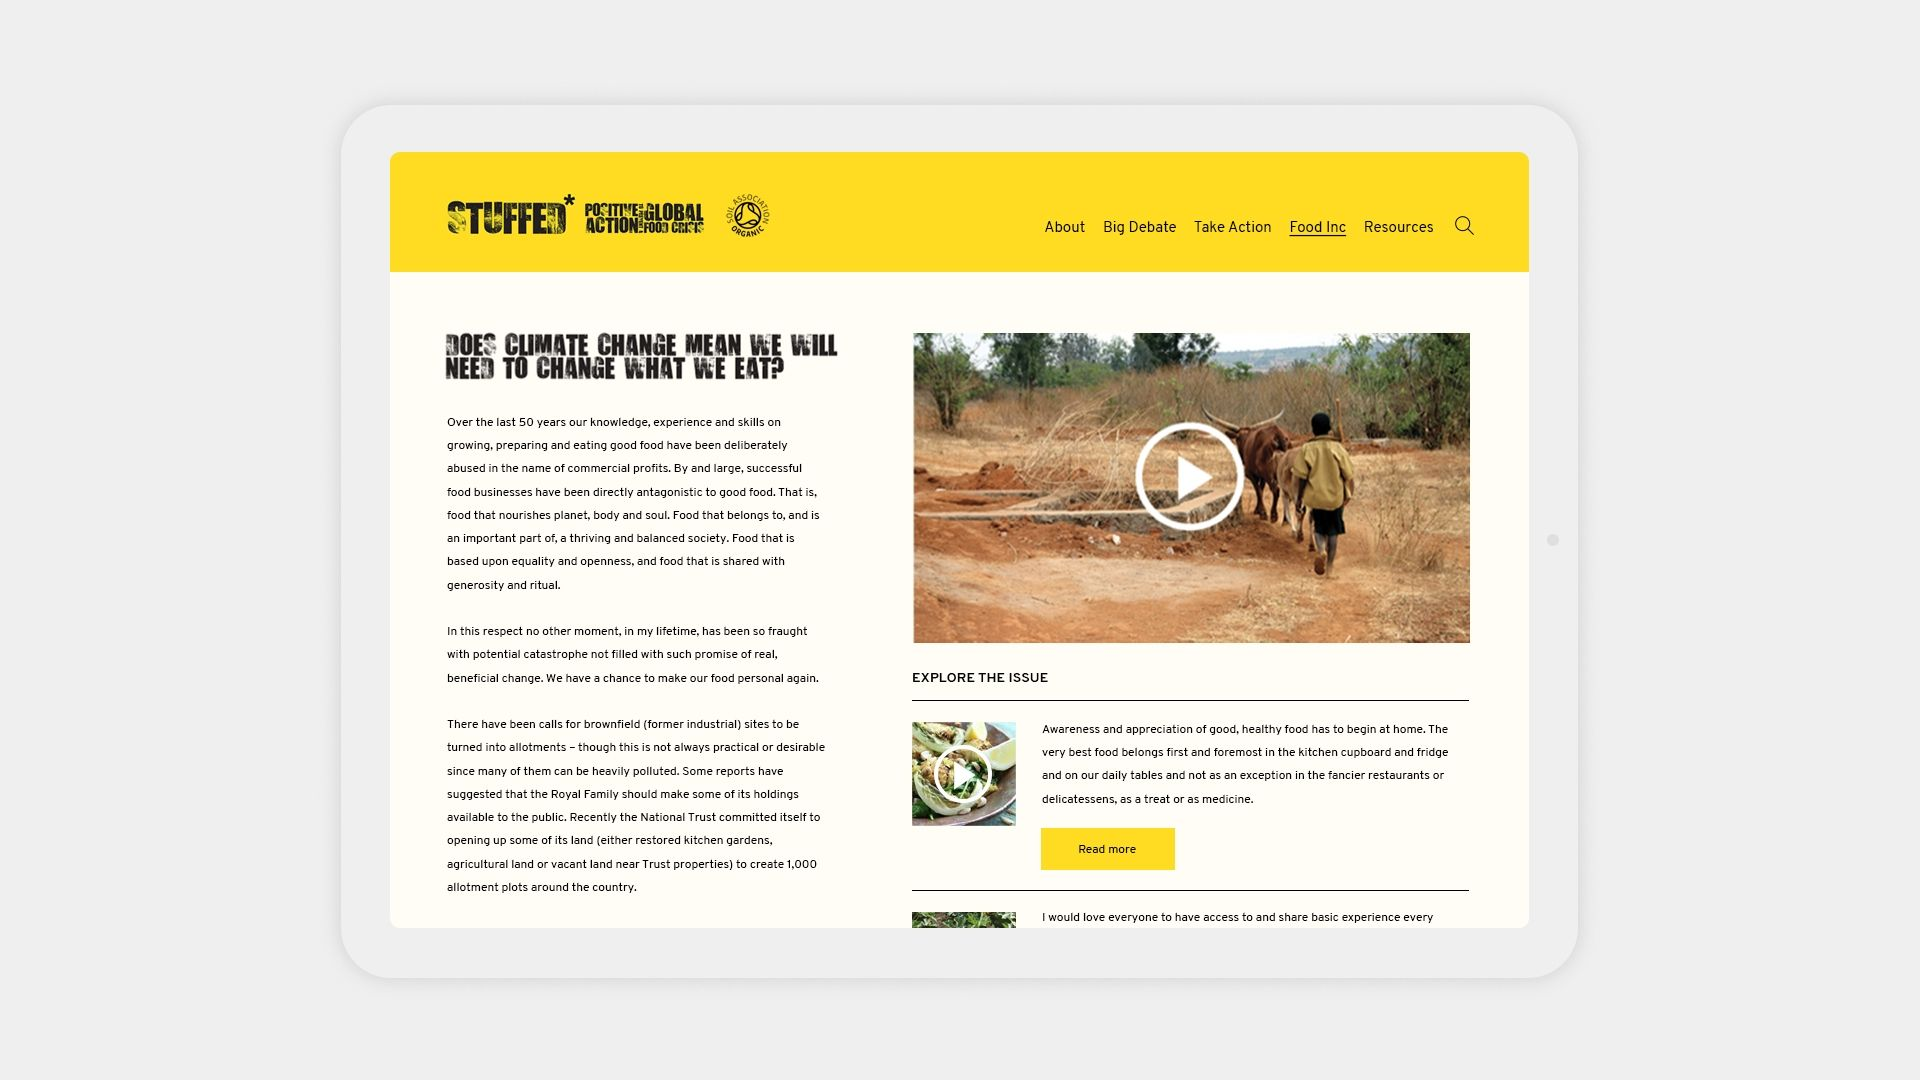 Soil Association Stuffed Responsive Website Design shown on a tablet